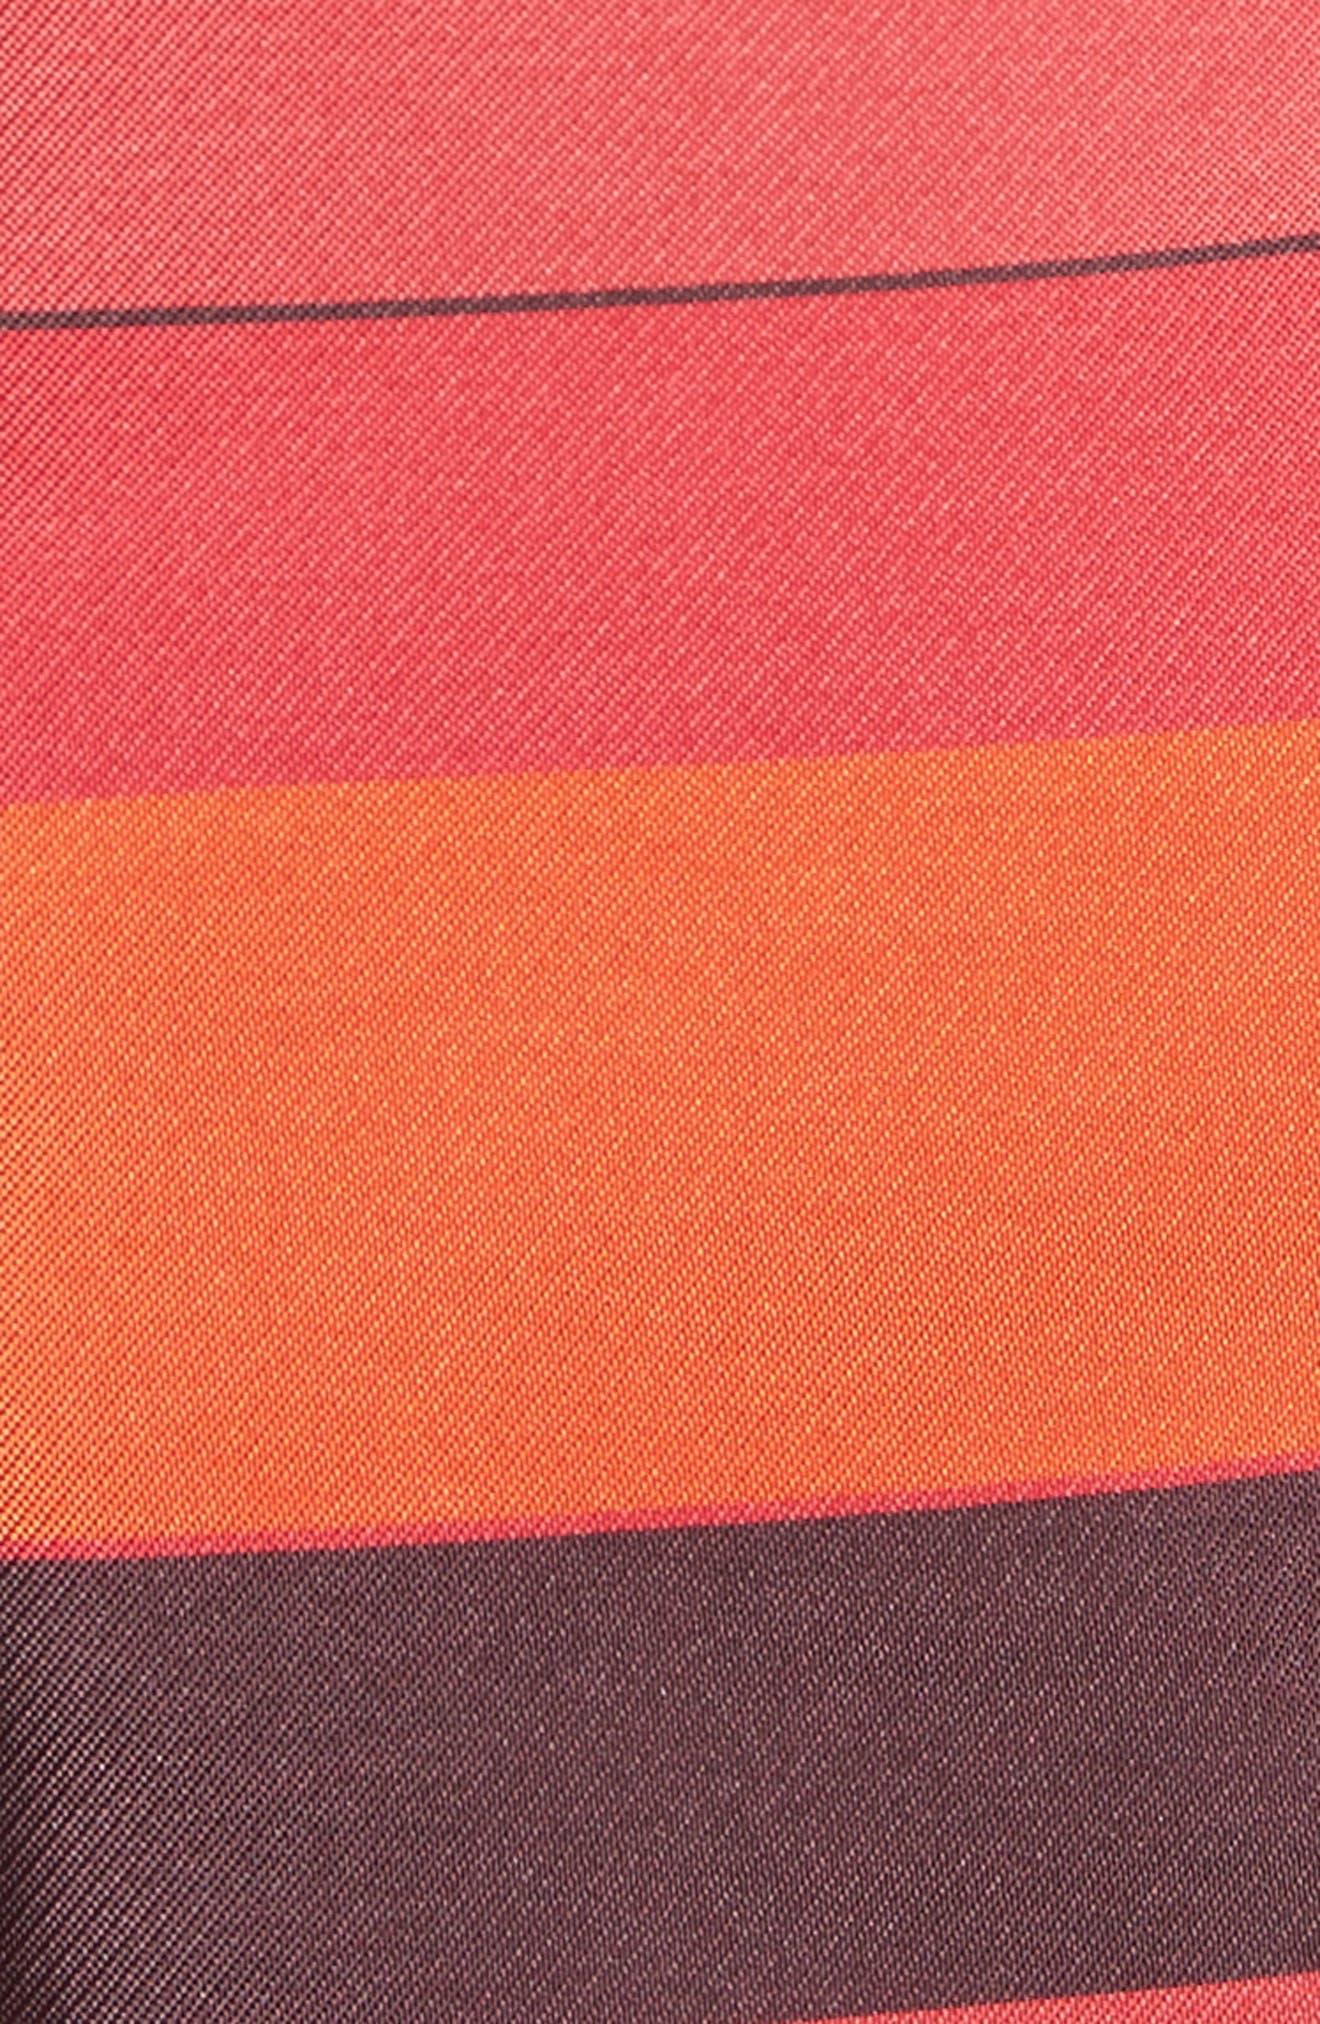 Metallic Stripe Jacquard Jacket,                             Alternate thumbnail 7, color,                             SIENNA MULTI